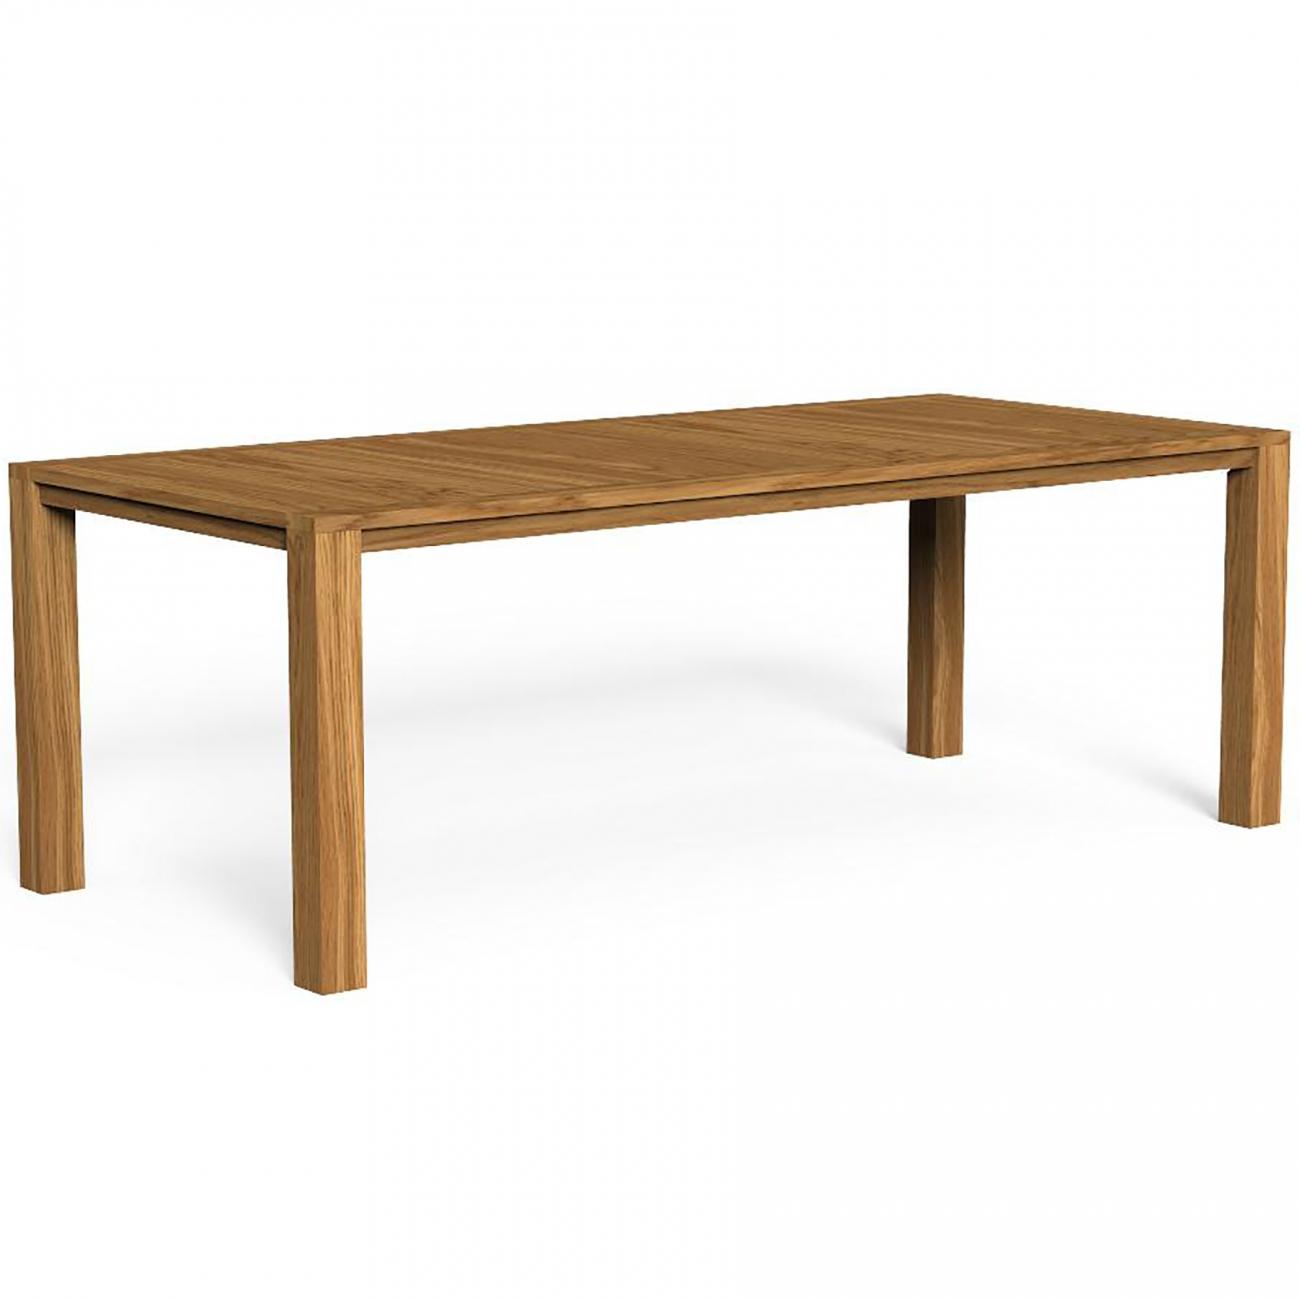 Talenti Ebi dining table